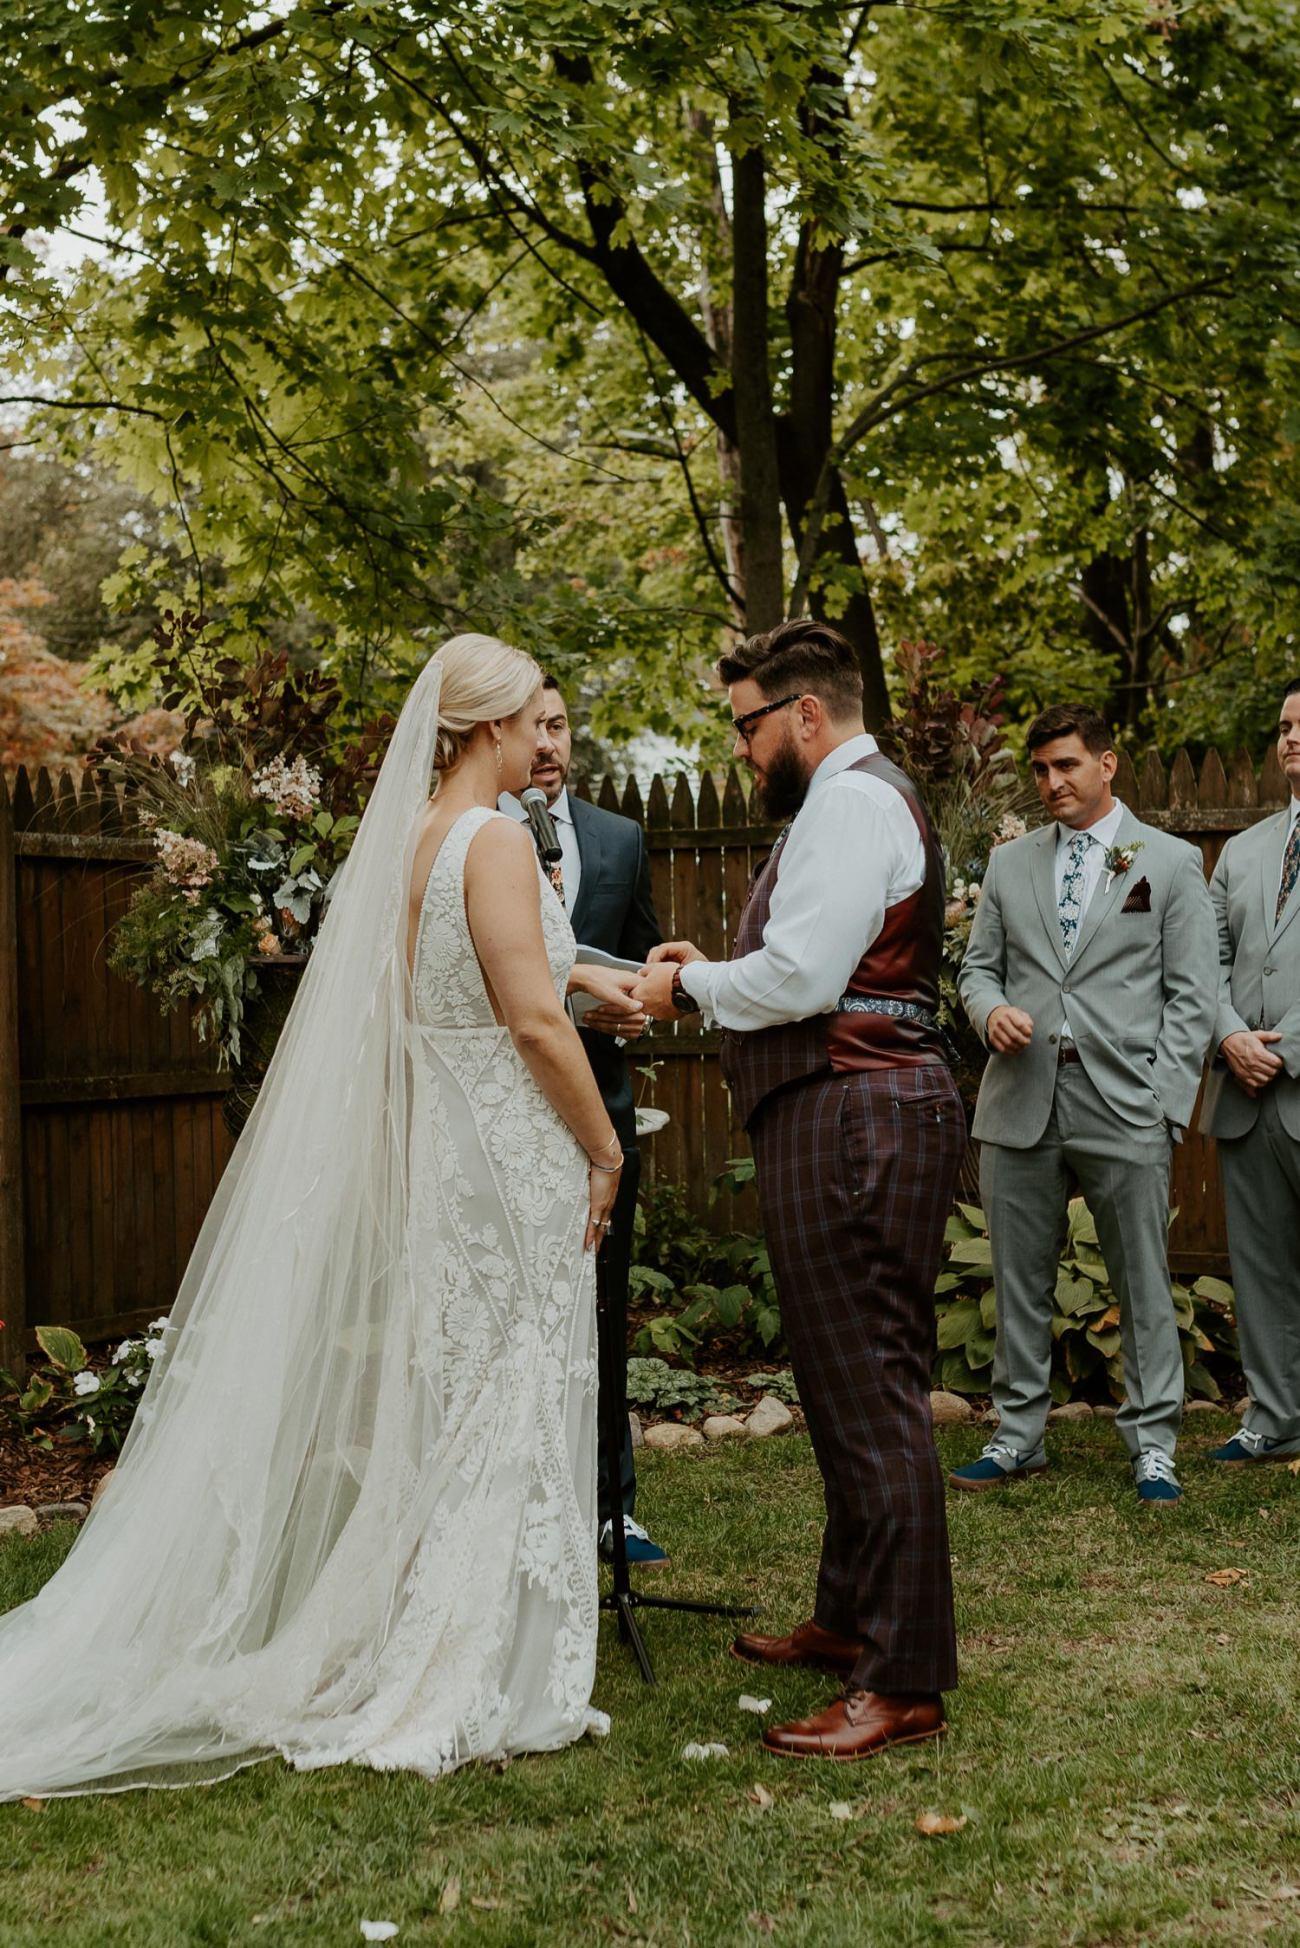 New Jersey Fall Backyard Wedding Bend Wedding Photographer NJ Wedding Photographer Anais Possamai Photography 049